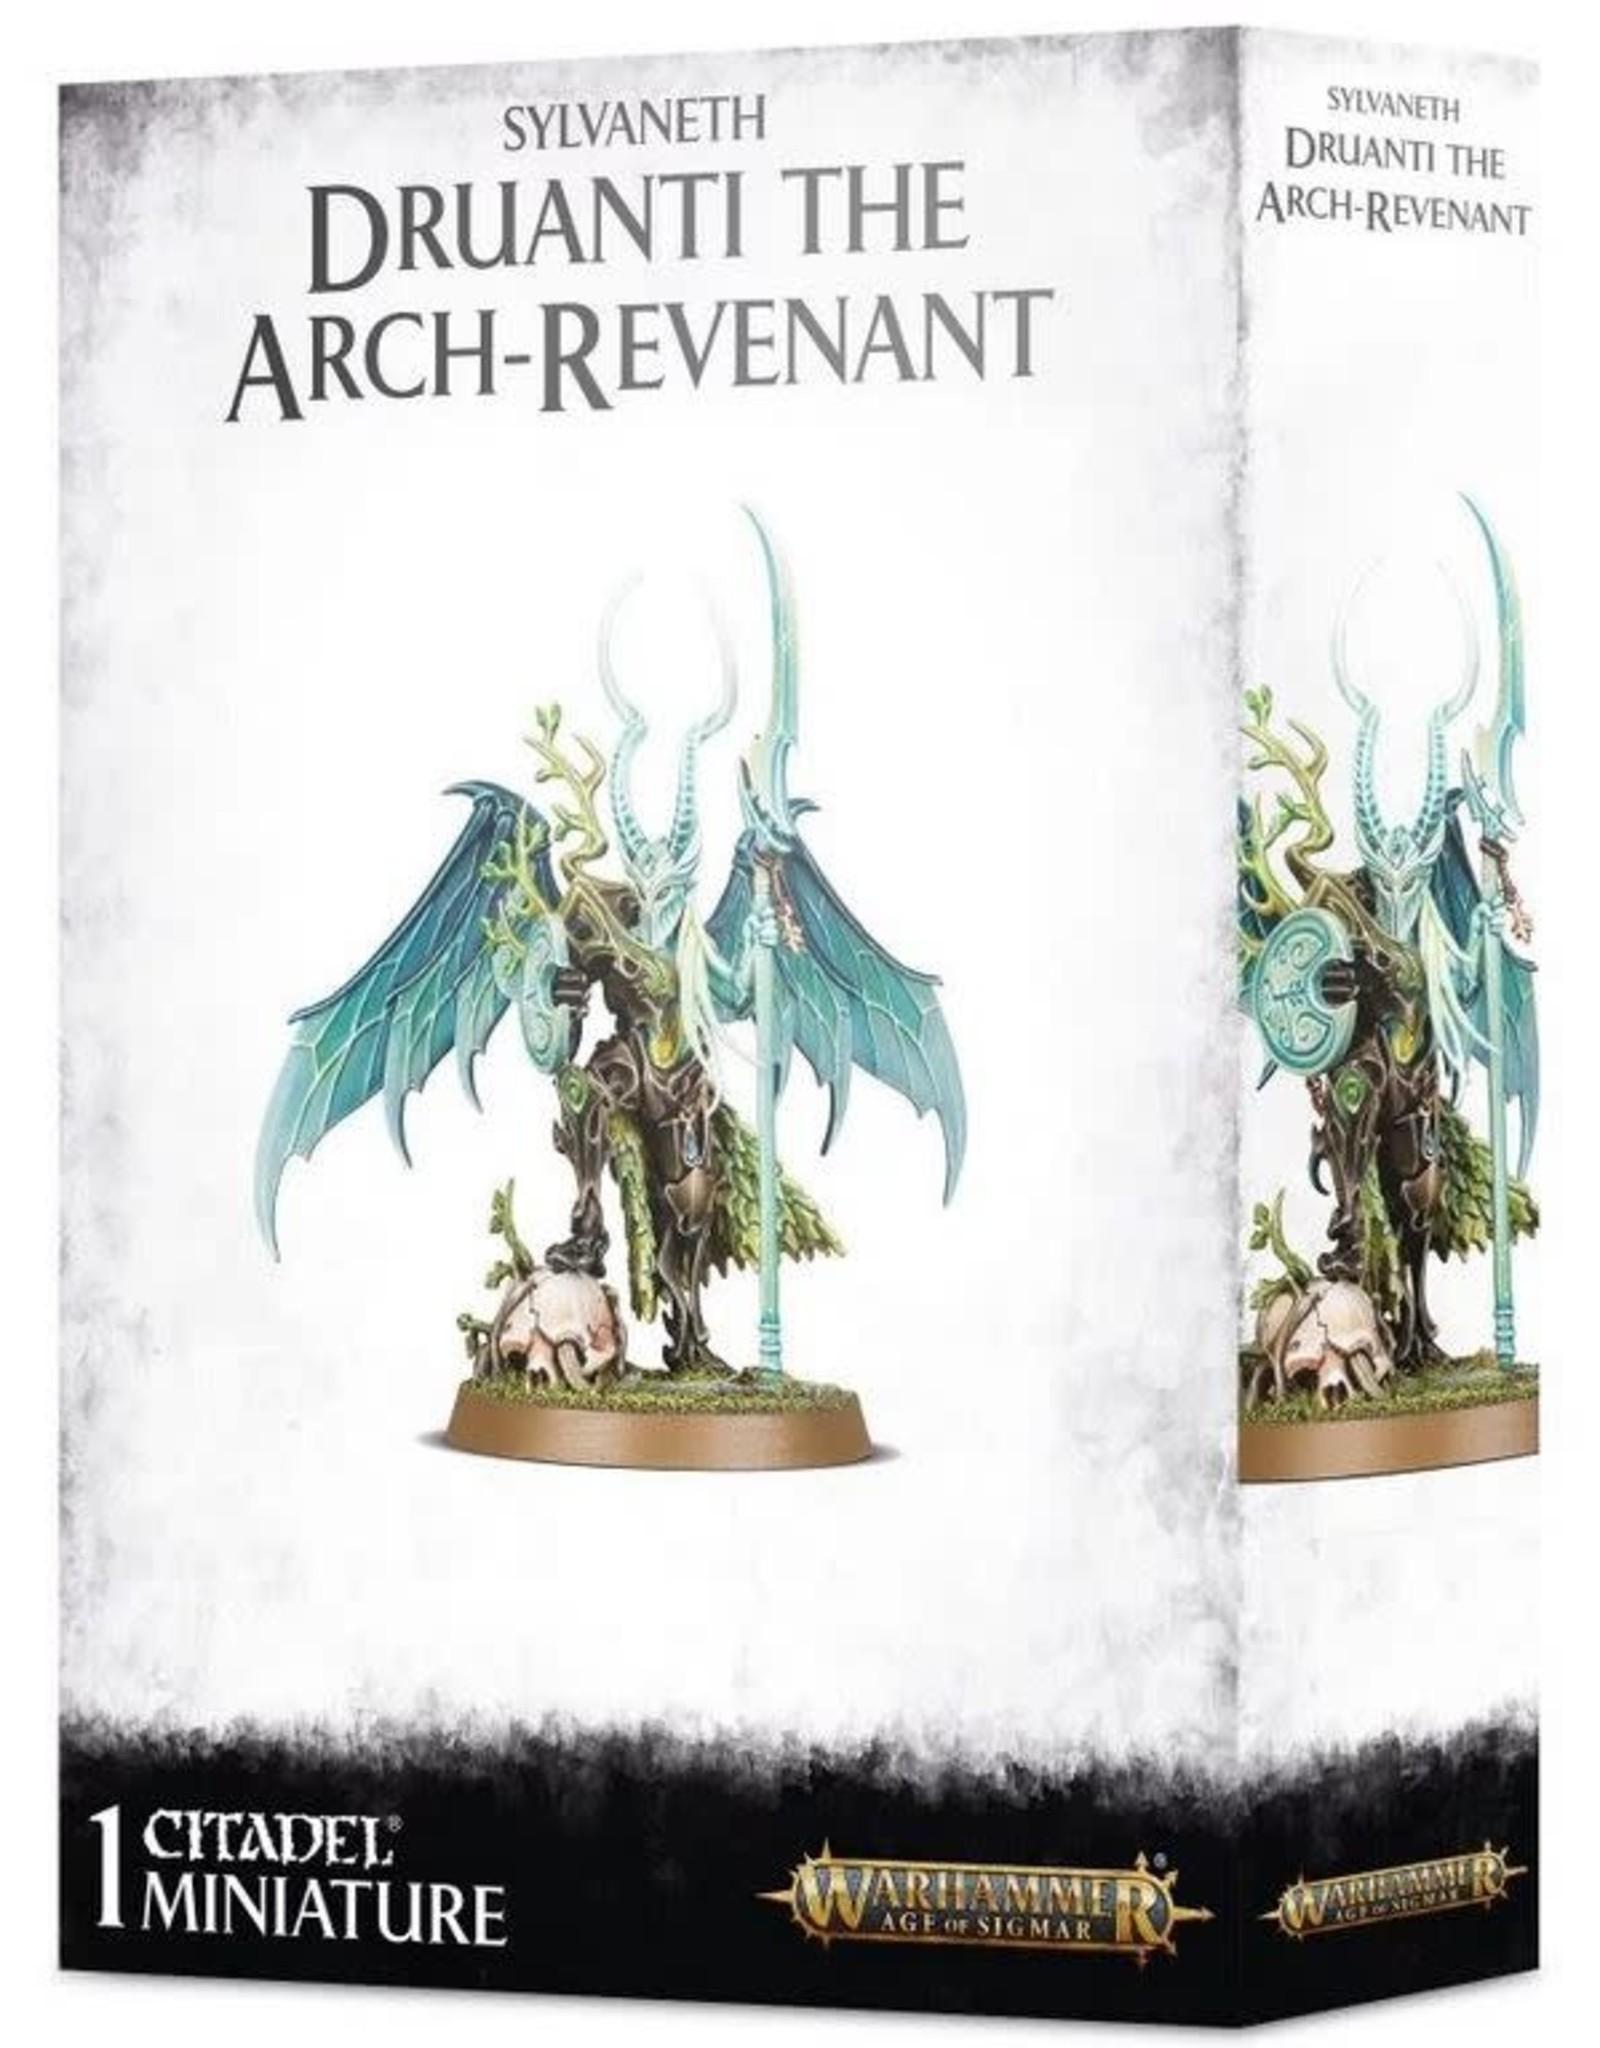 Games Workshop DRUANTI THE ARCH-REVENANT